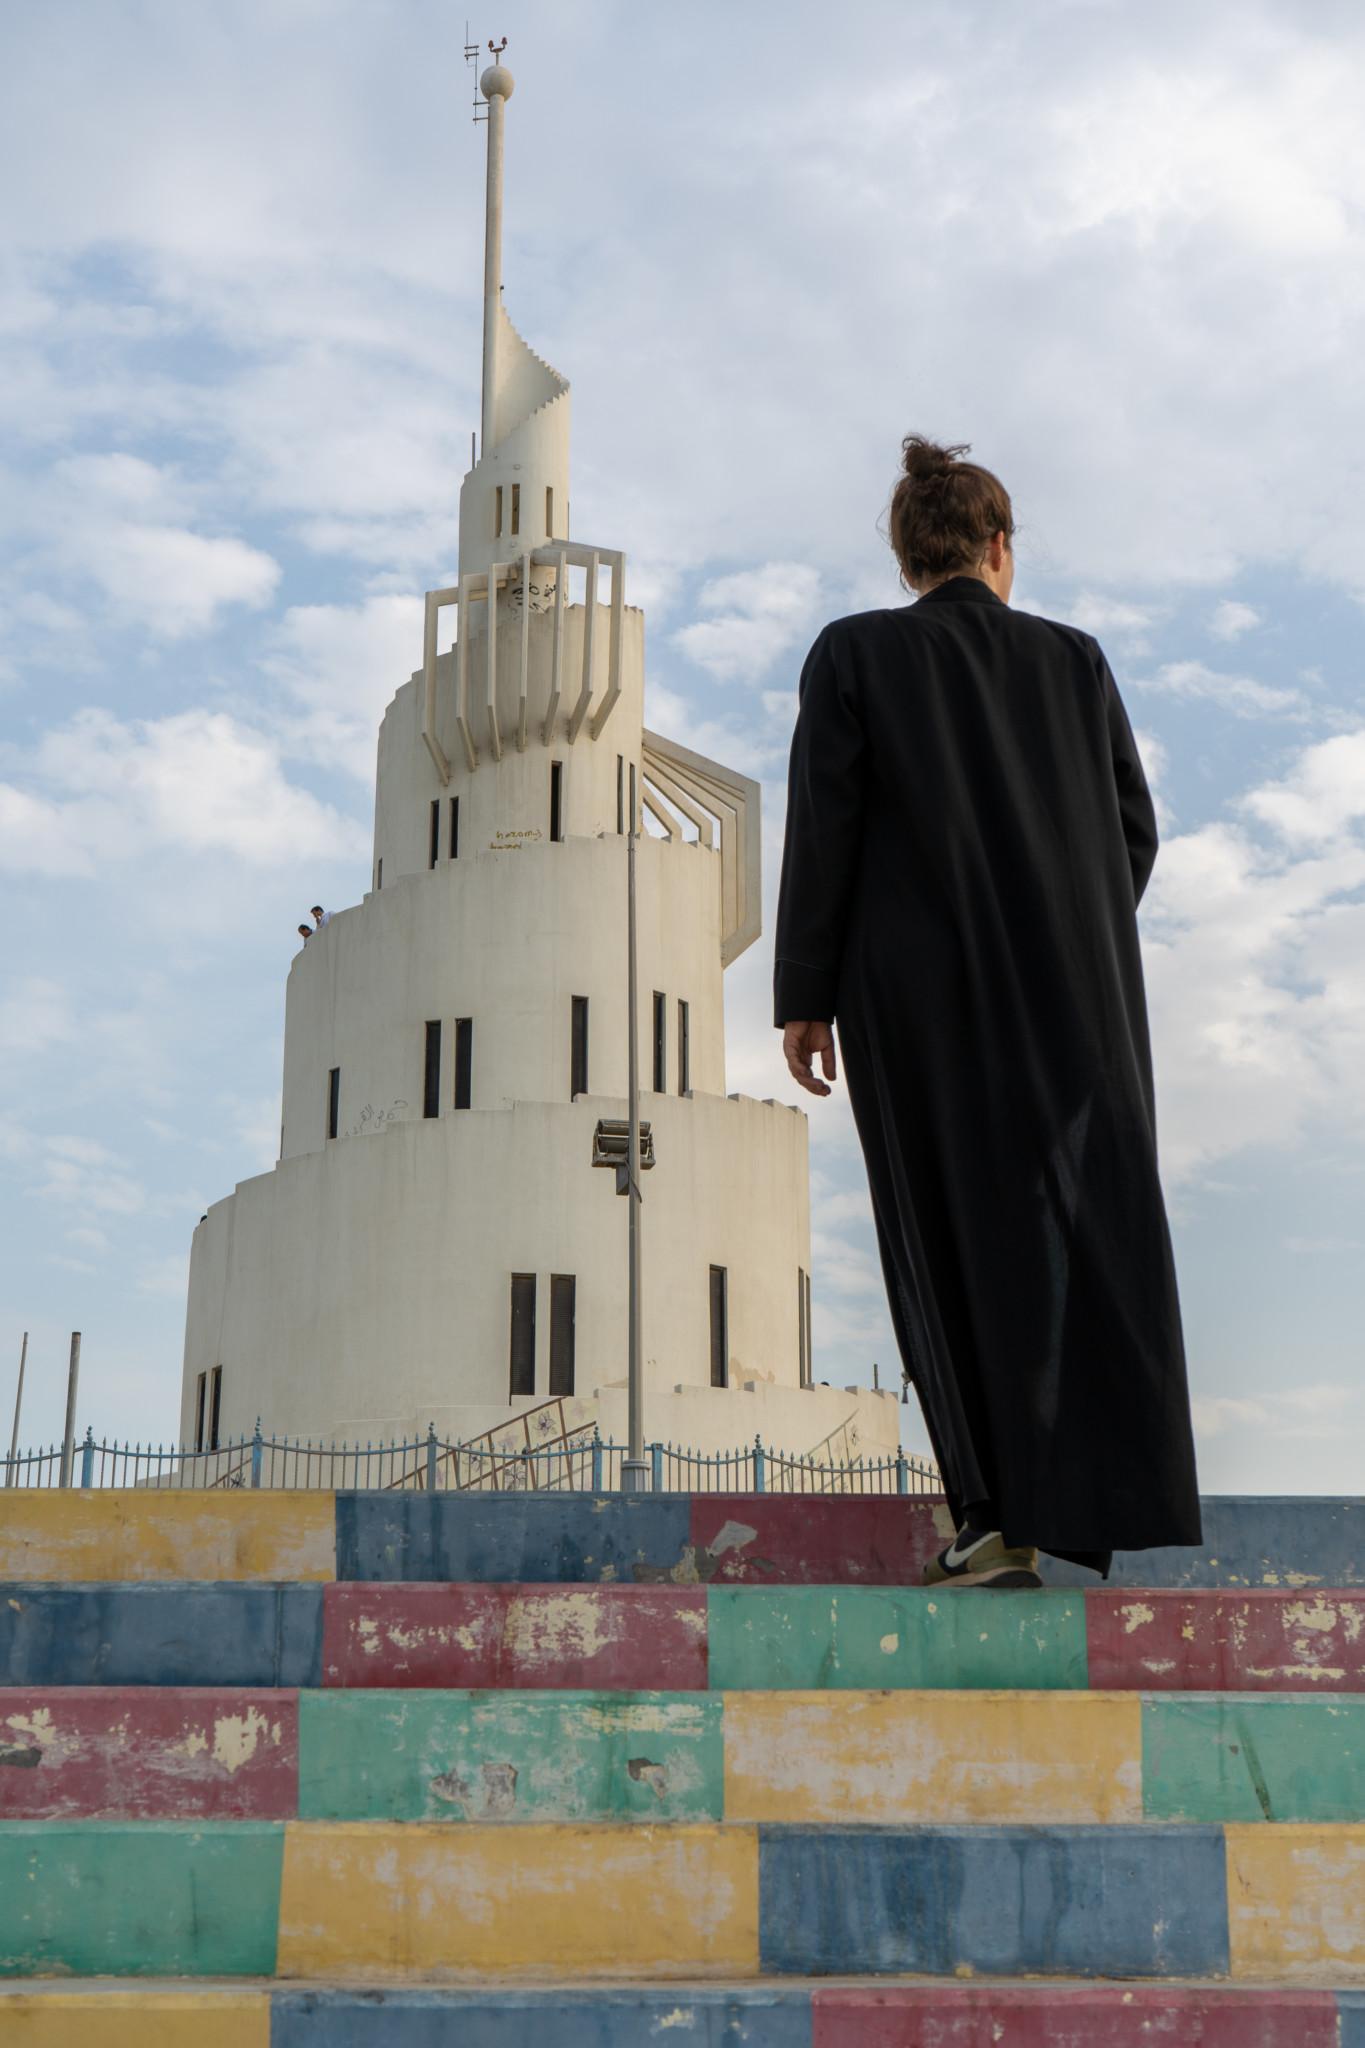 Der berühmte Turm auf Marjan Island in Dammam